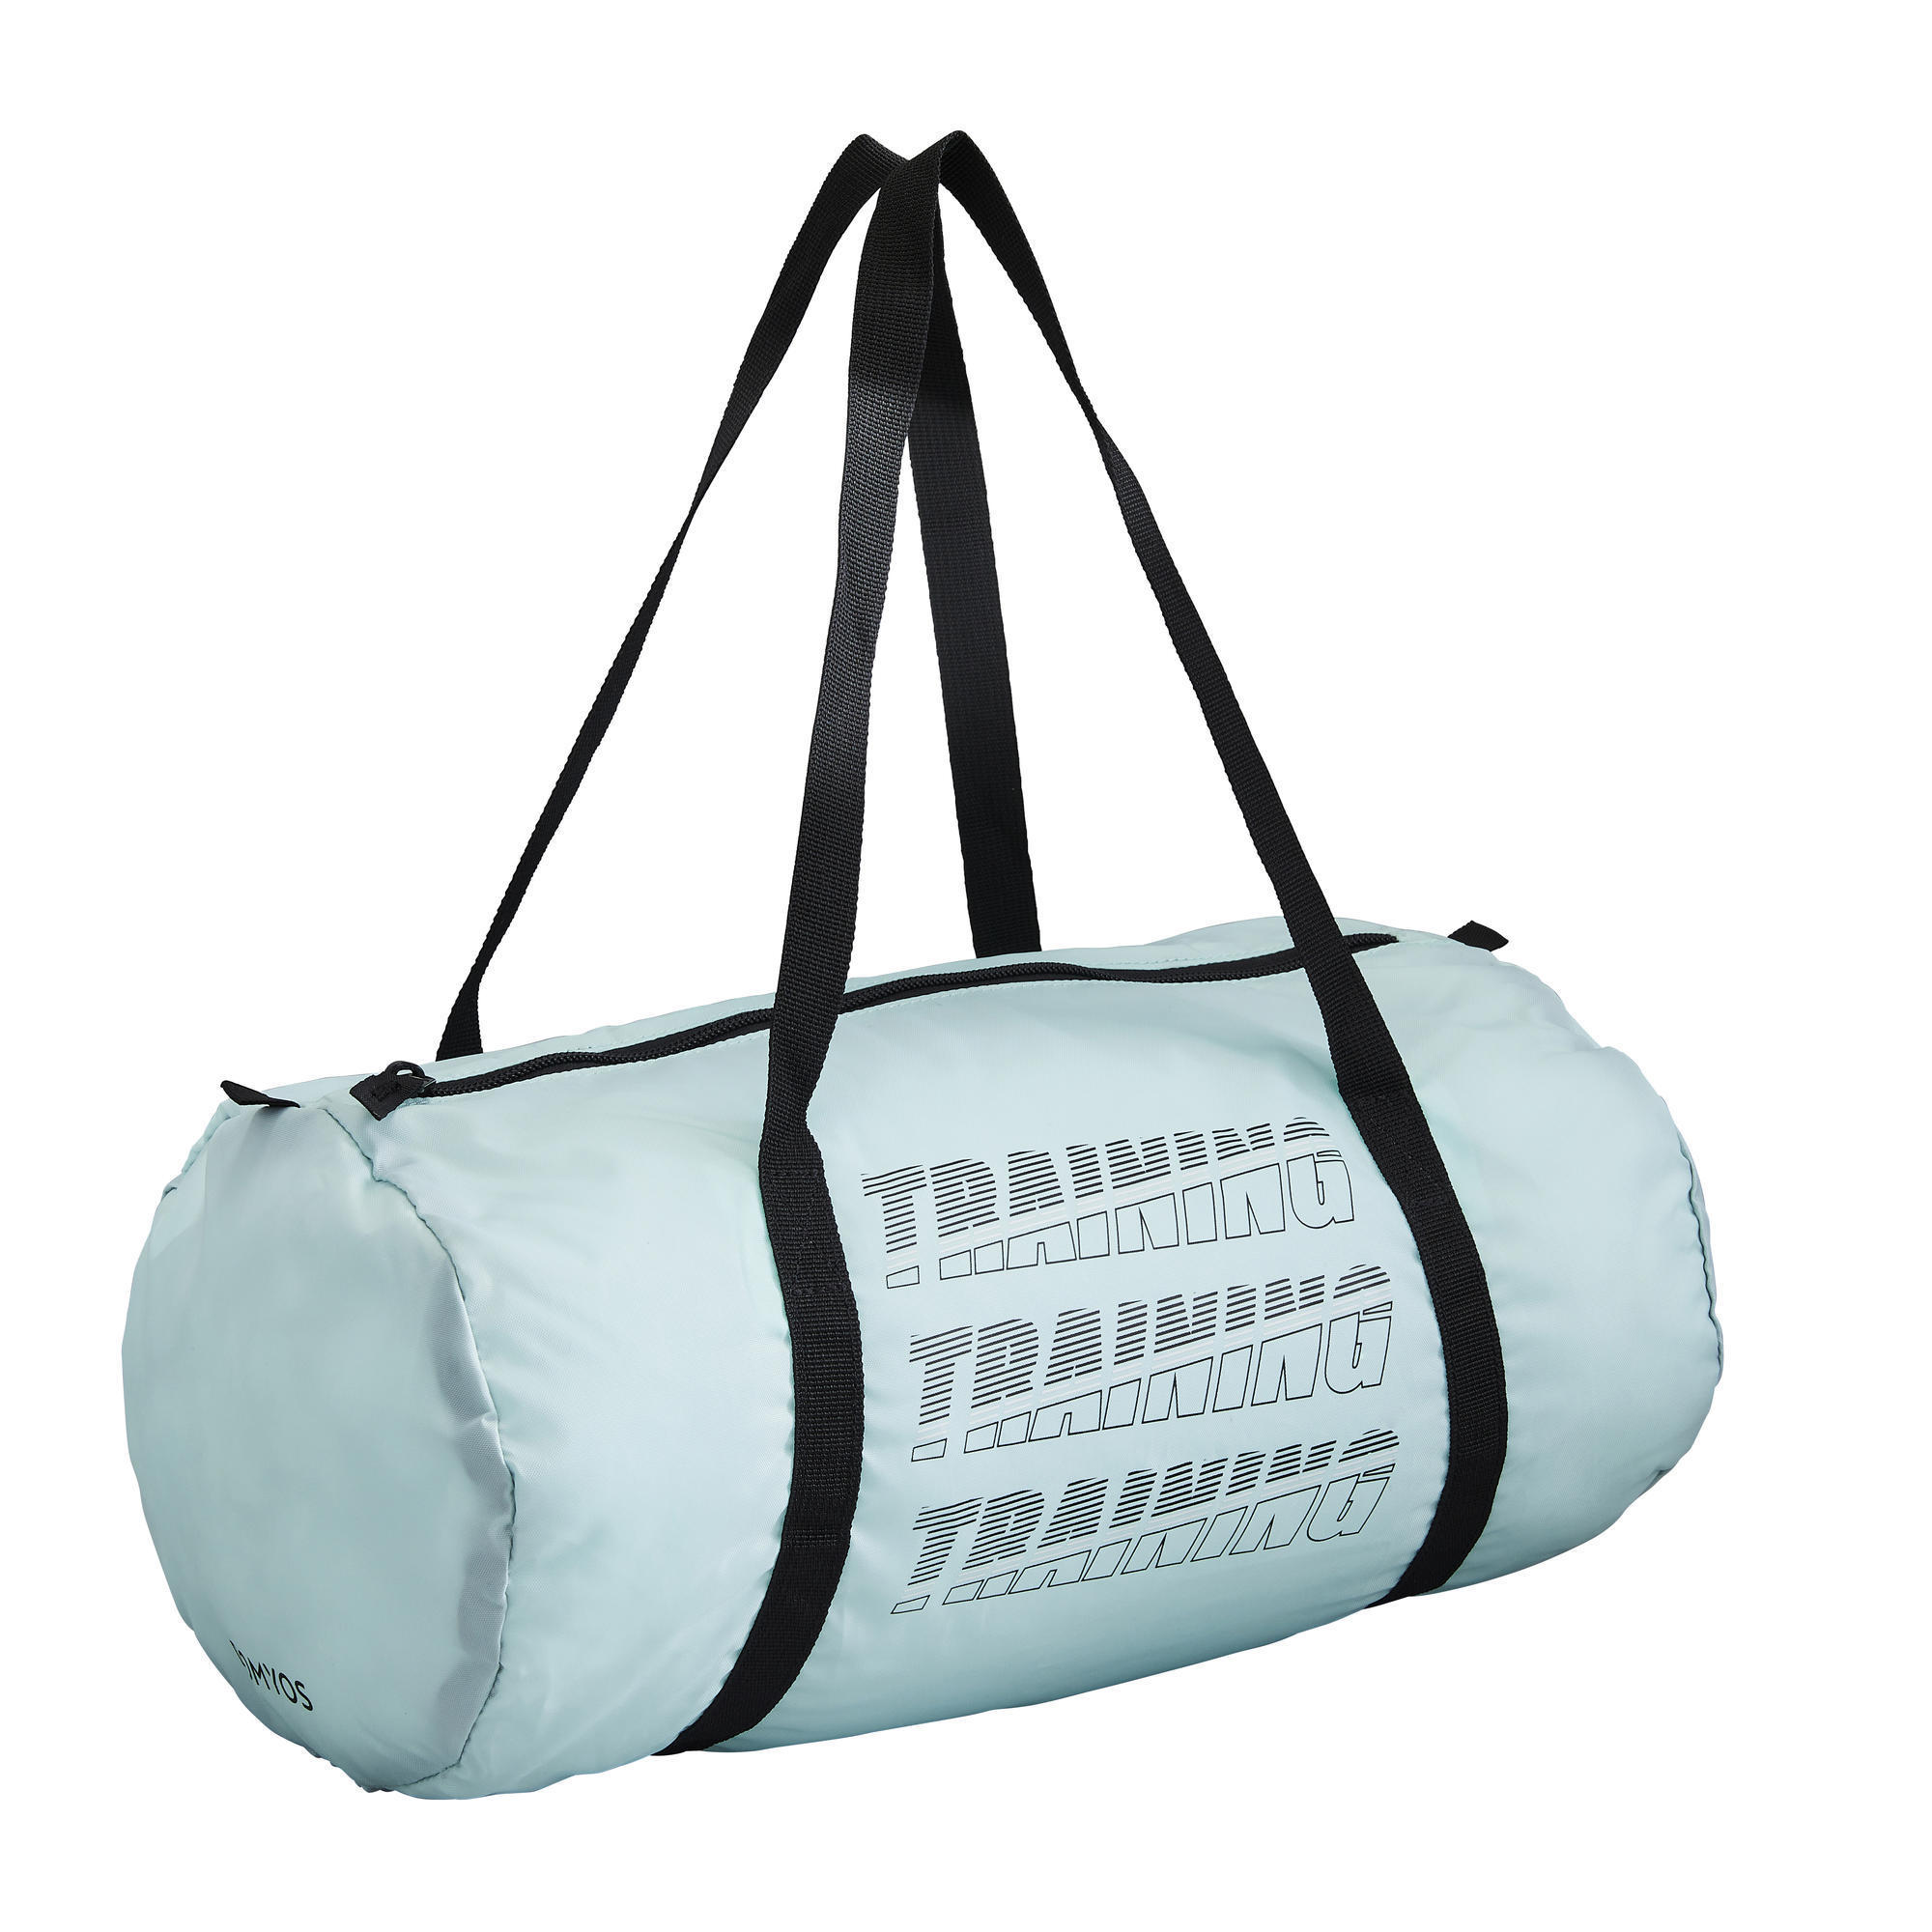 15L Folding Cardio Training Fitness Bag - Mint